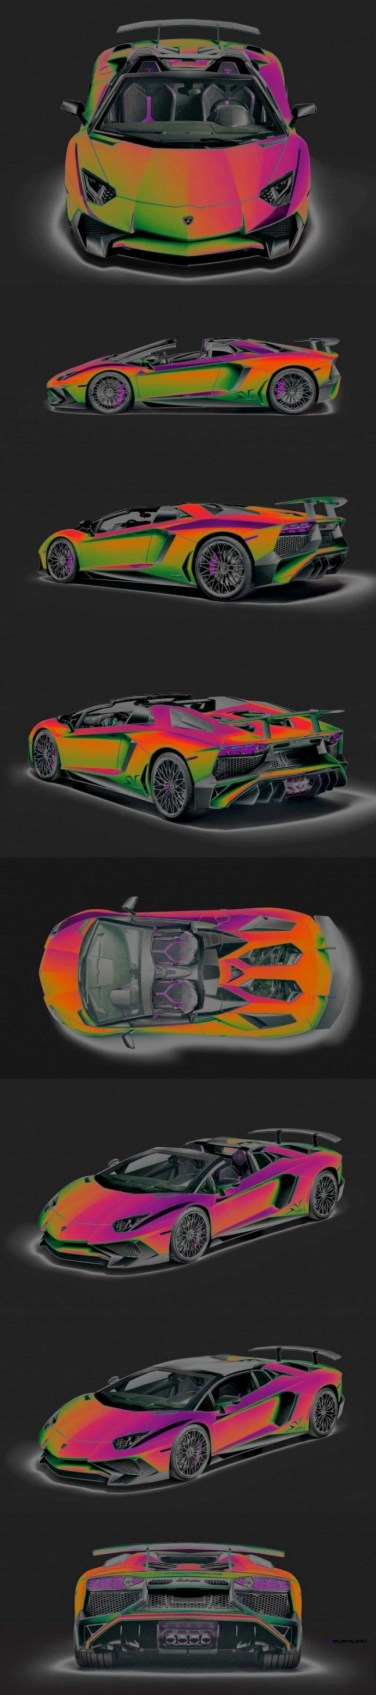 2016-Lamborghini-Aventador-LP-750-4-Superveloce-Roadgfxster-11